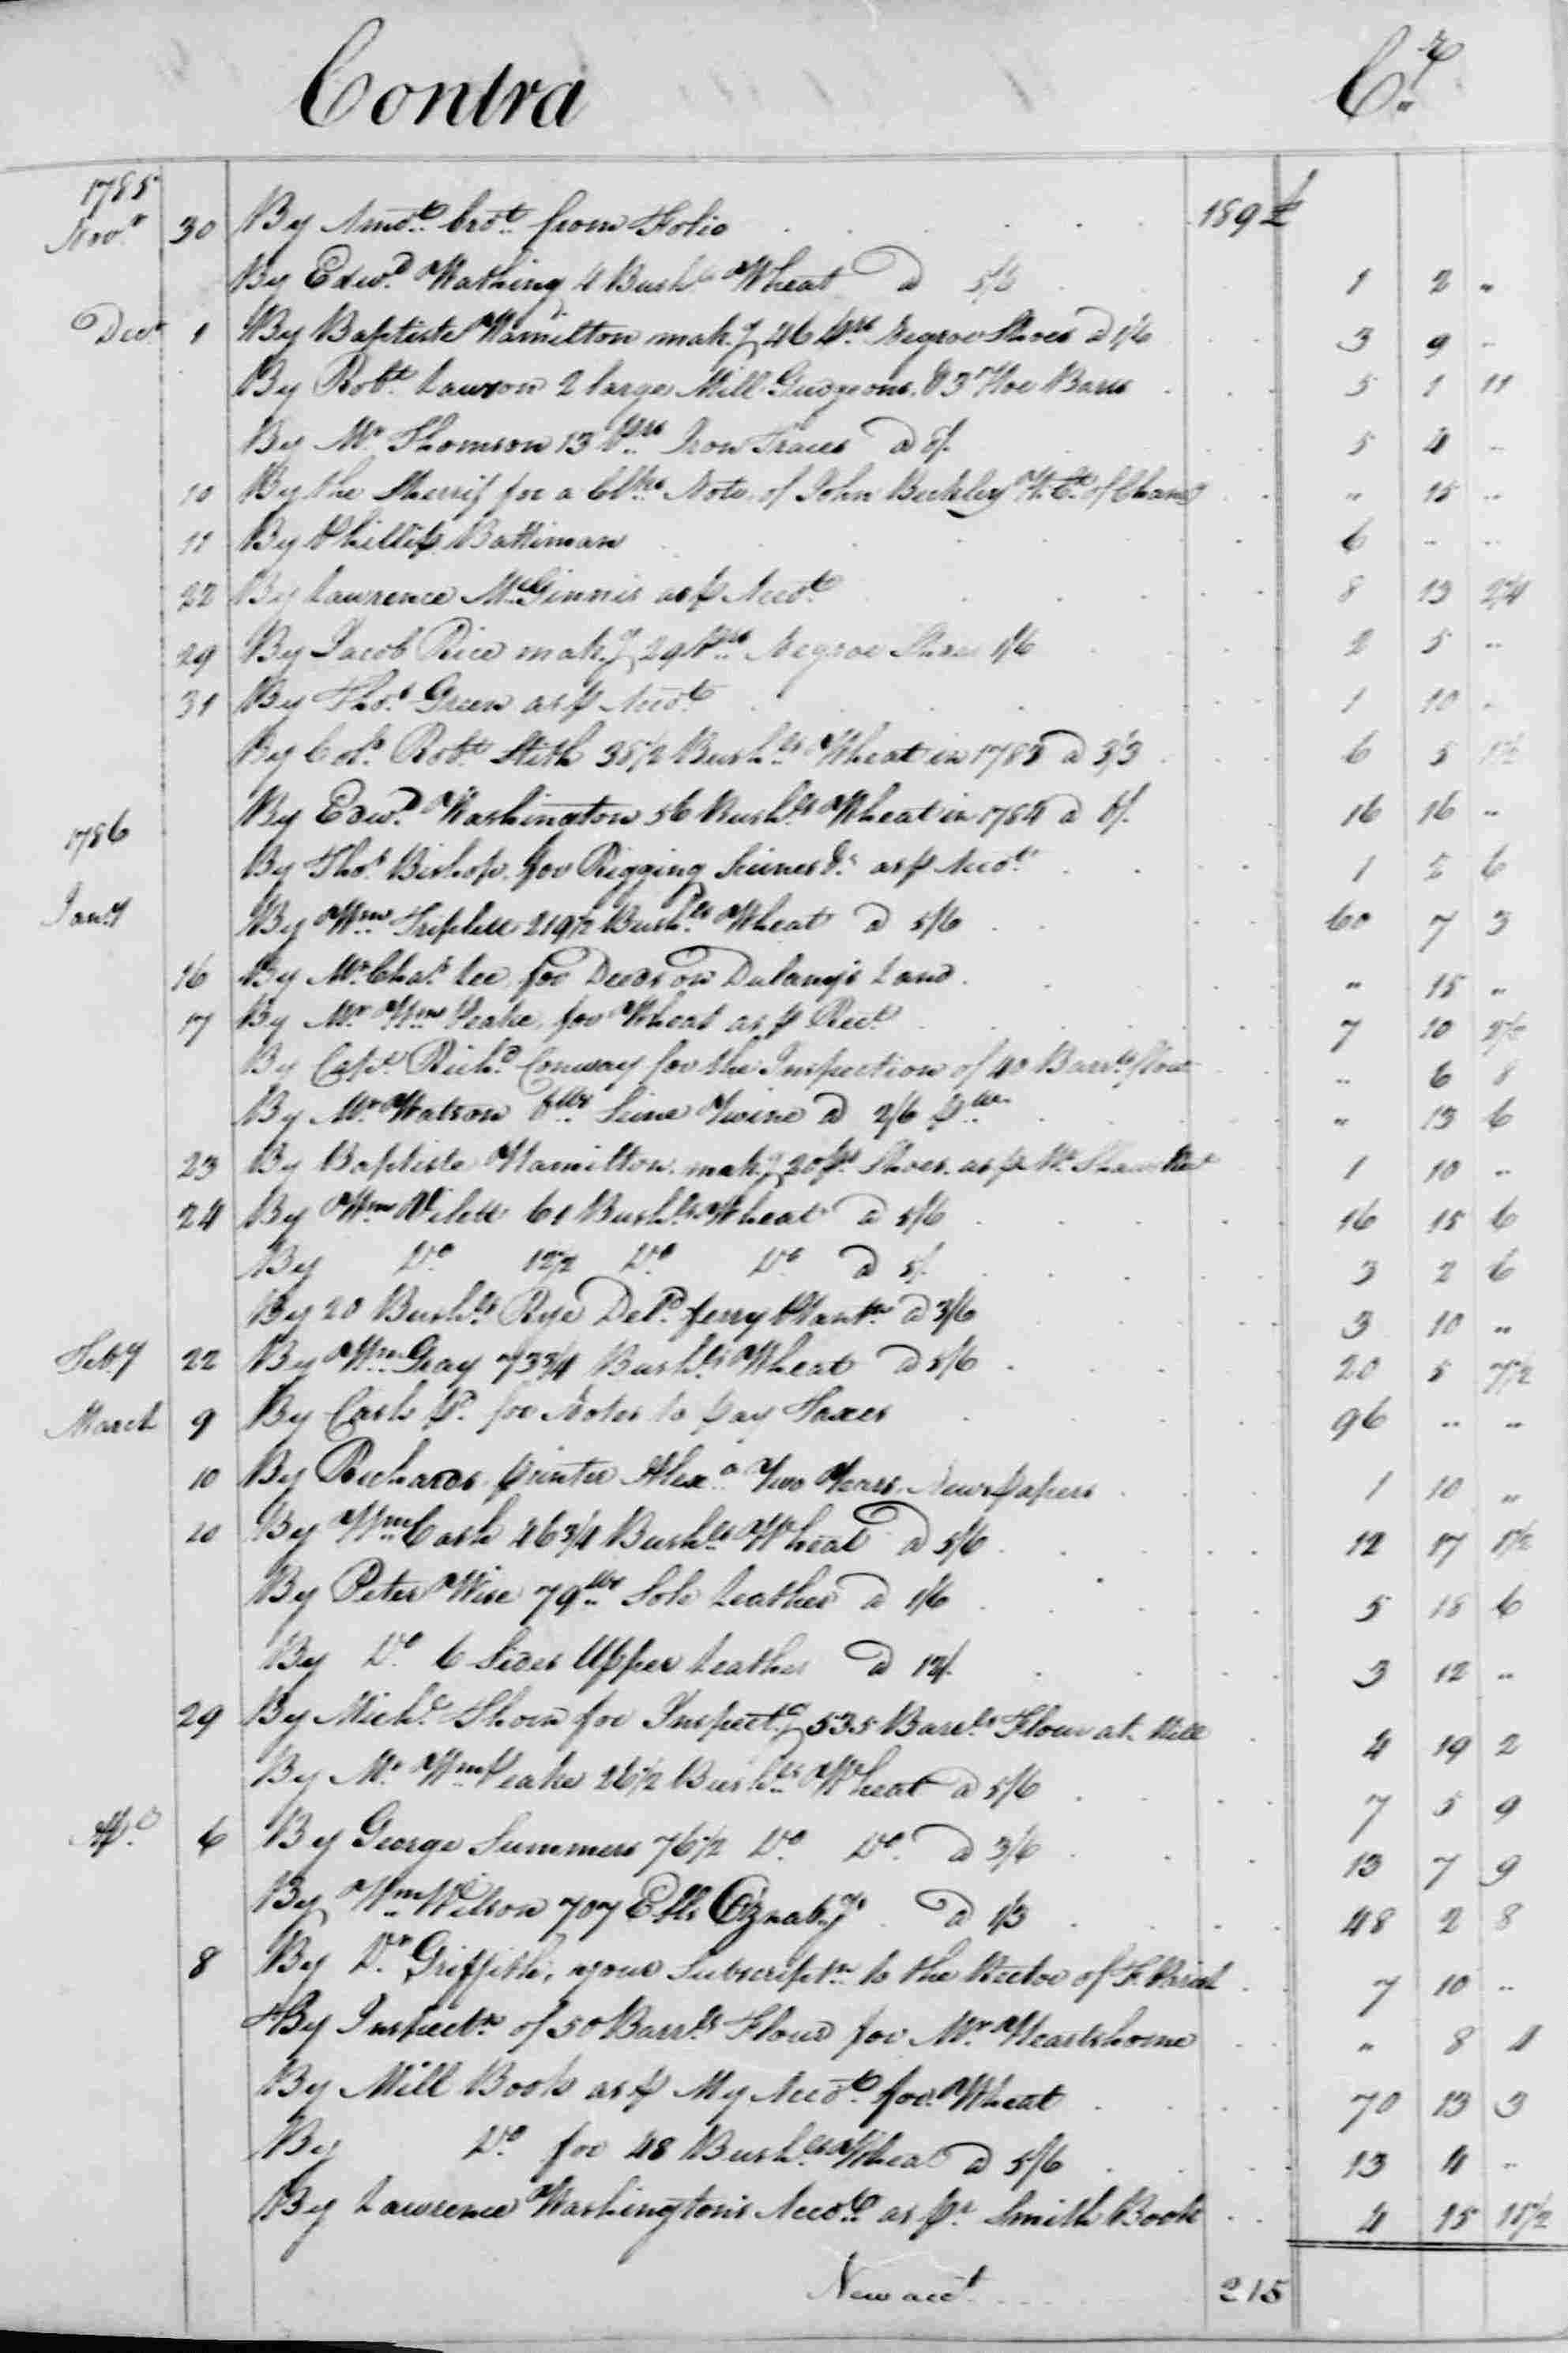 Ledger B, folio 228, right side